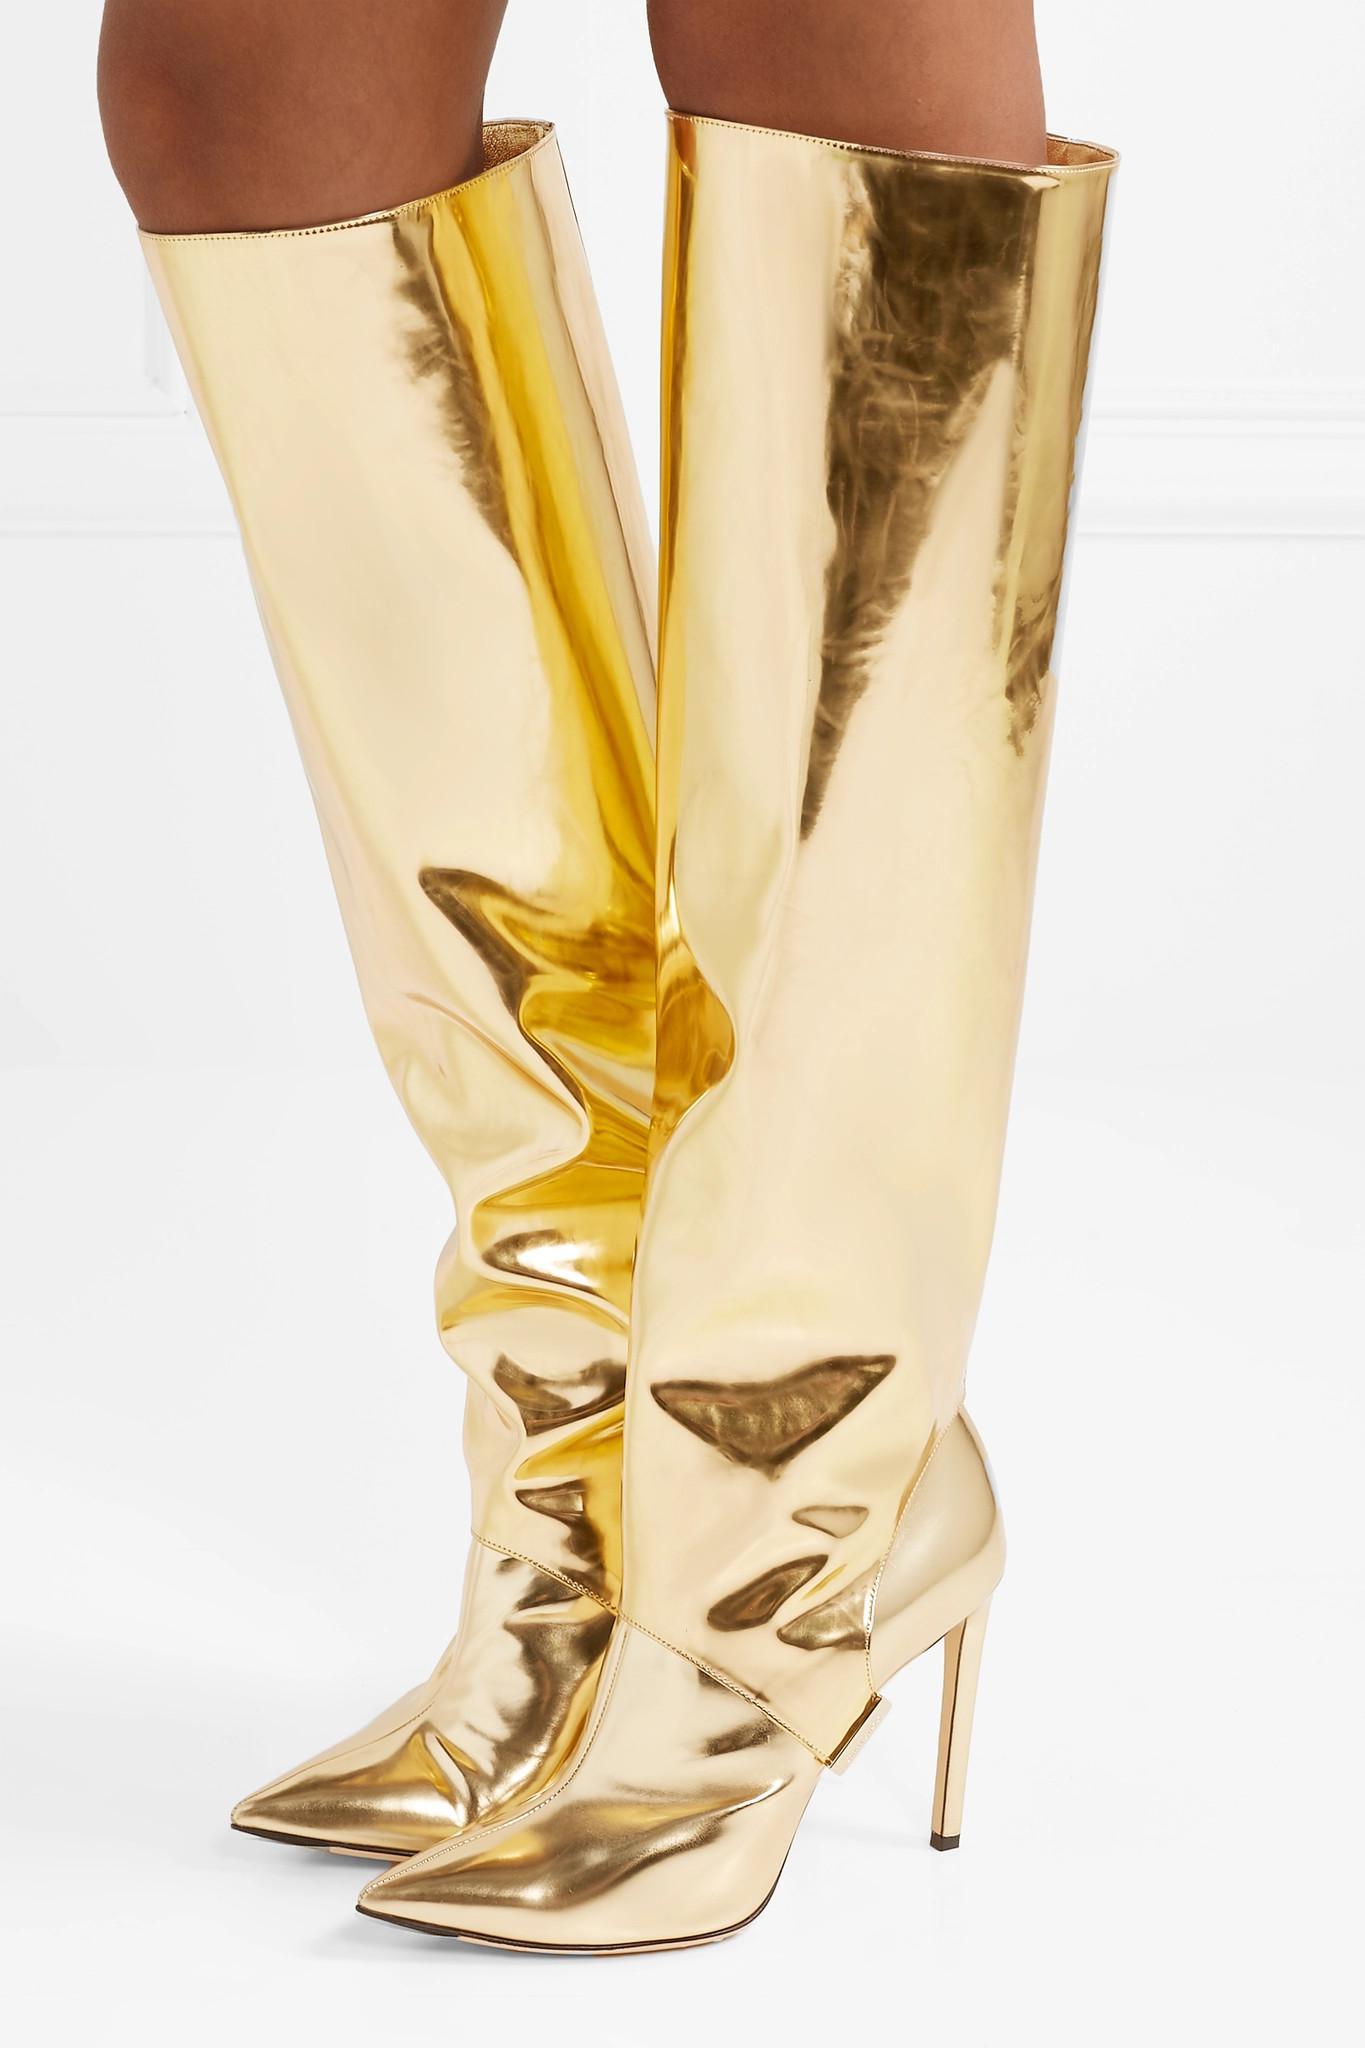 ef4bb5fc1857 Lyst - Jimmy Choo Hurley 100 Convertible Metallic Mirrored-leather ...